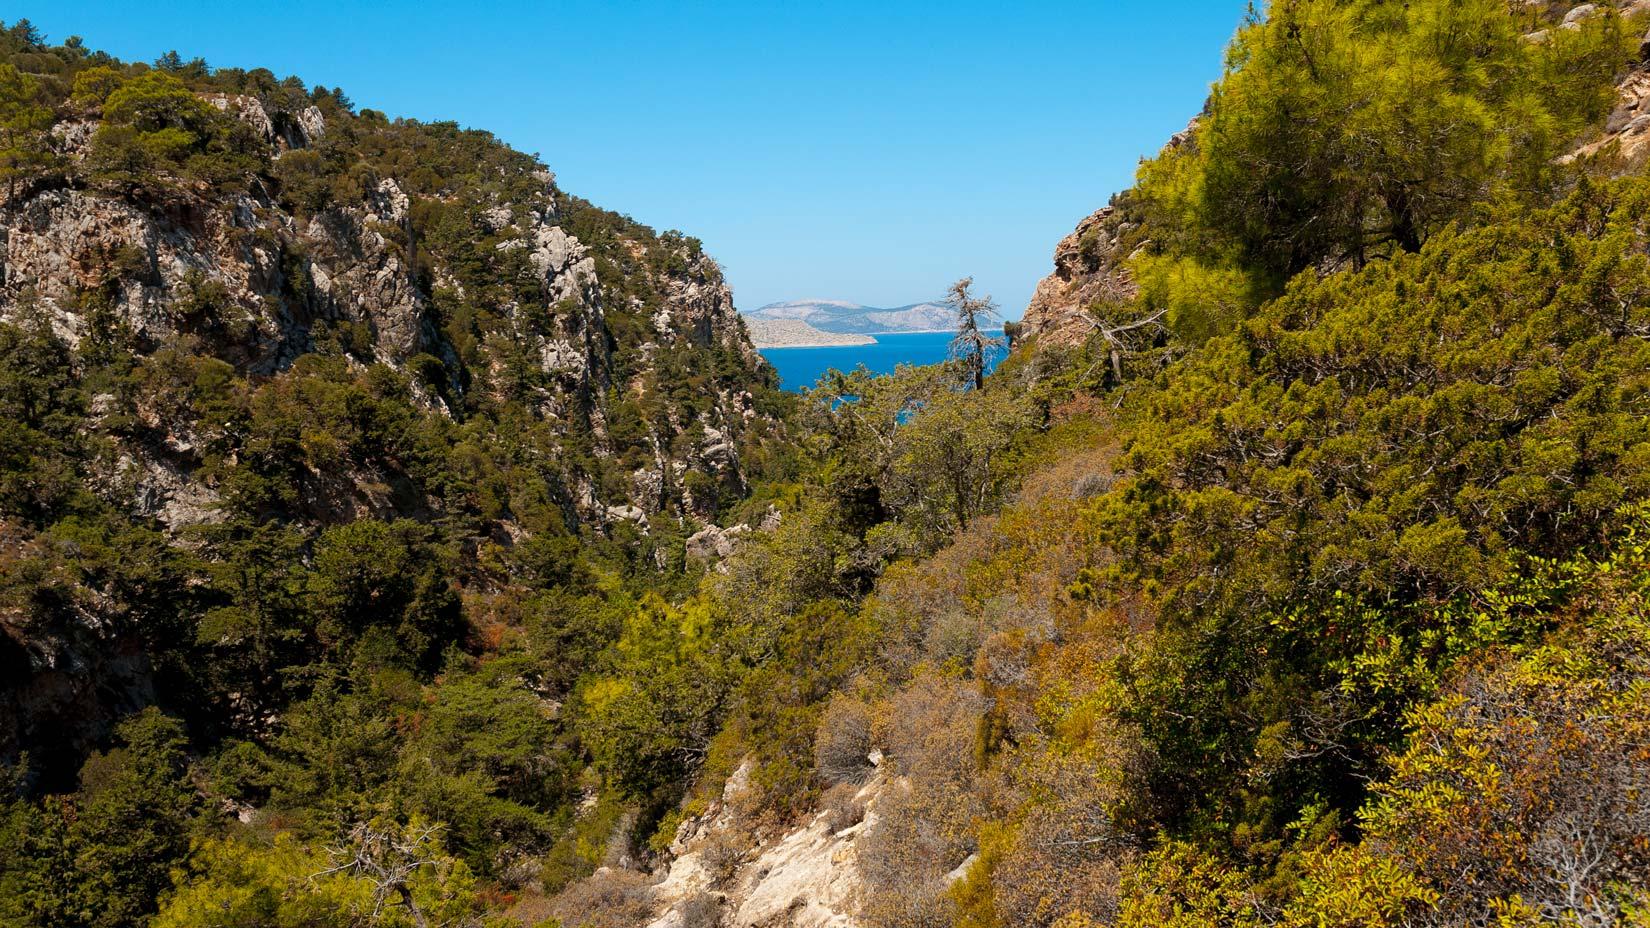 Úzkou pěšinou značenou červenými puntíky se dostanete po strmém svahu hlubokého údolí Vouria k divoké pláži